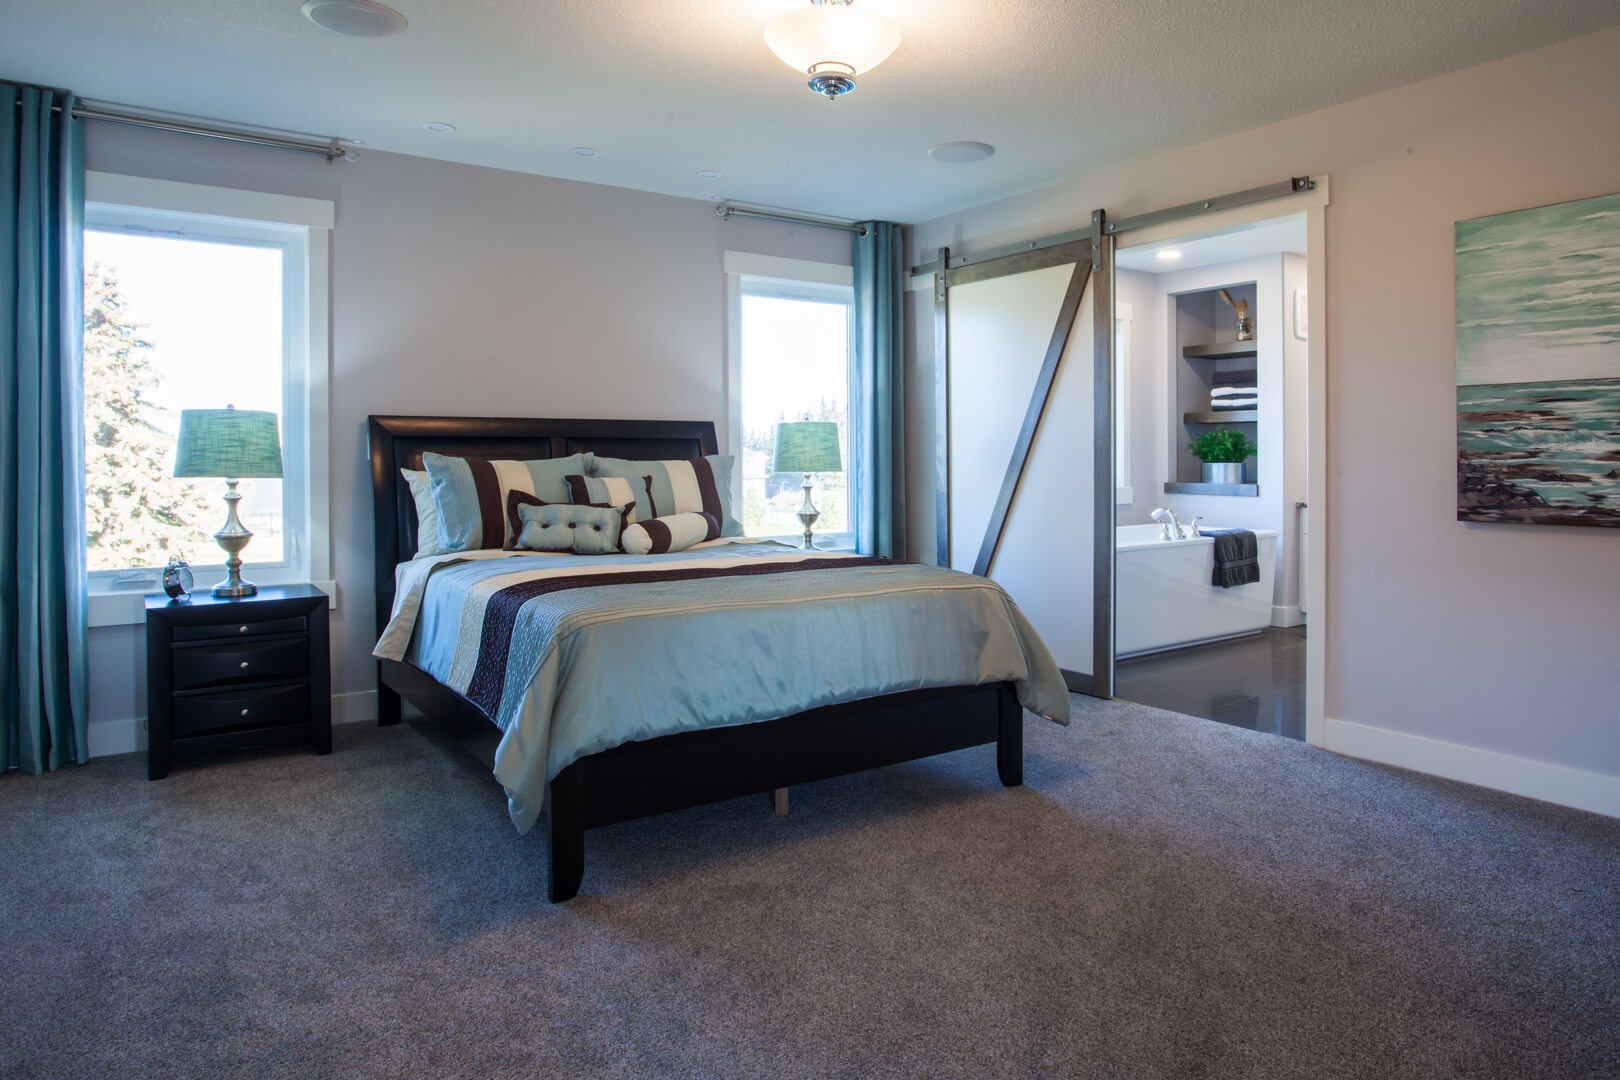 stoneshire-sh_rococo-homes_master-bedroom